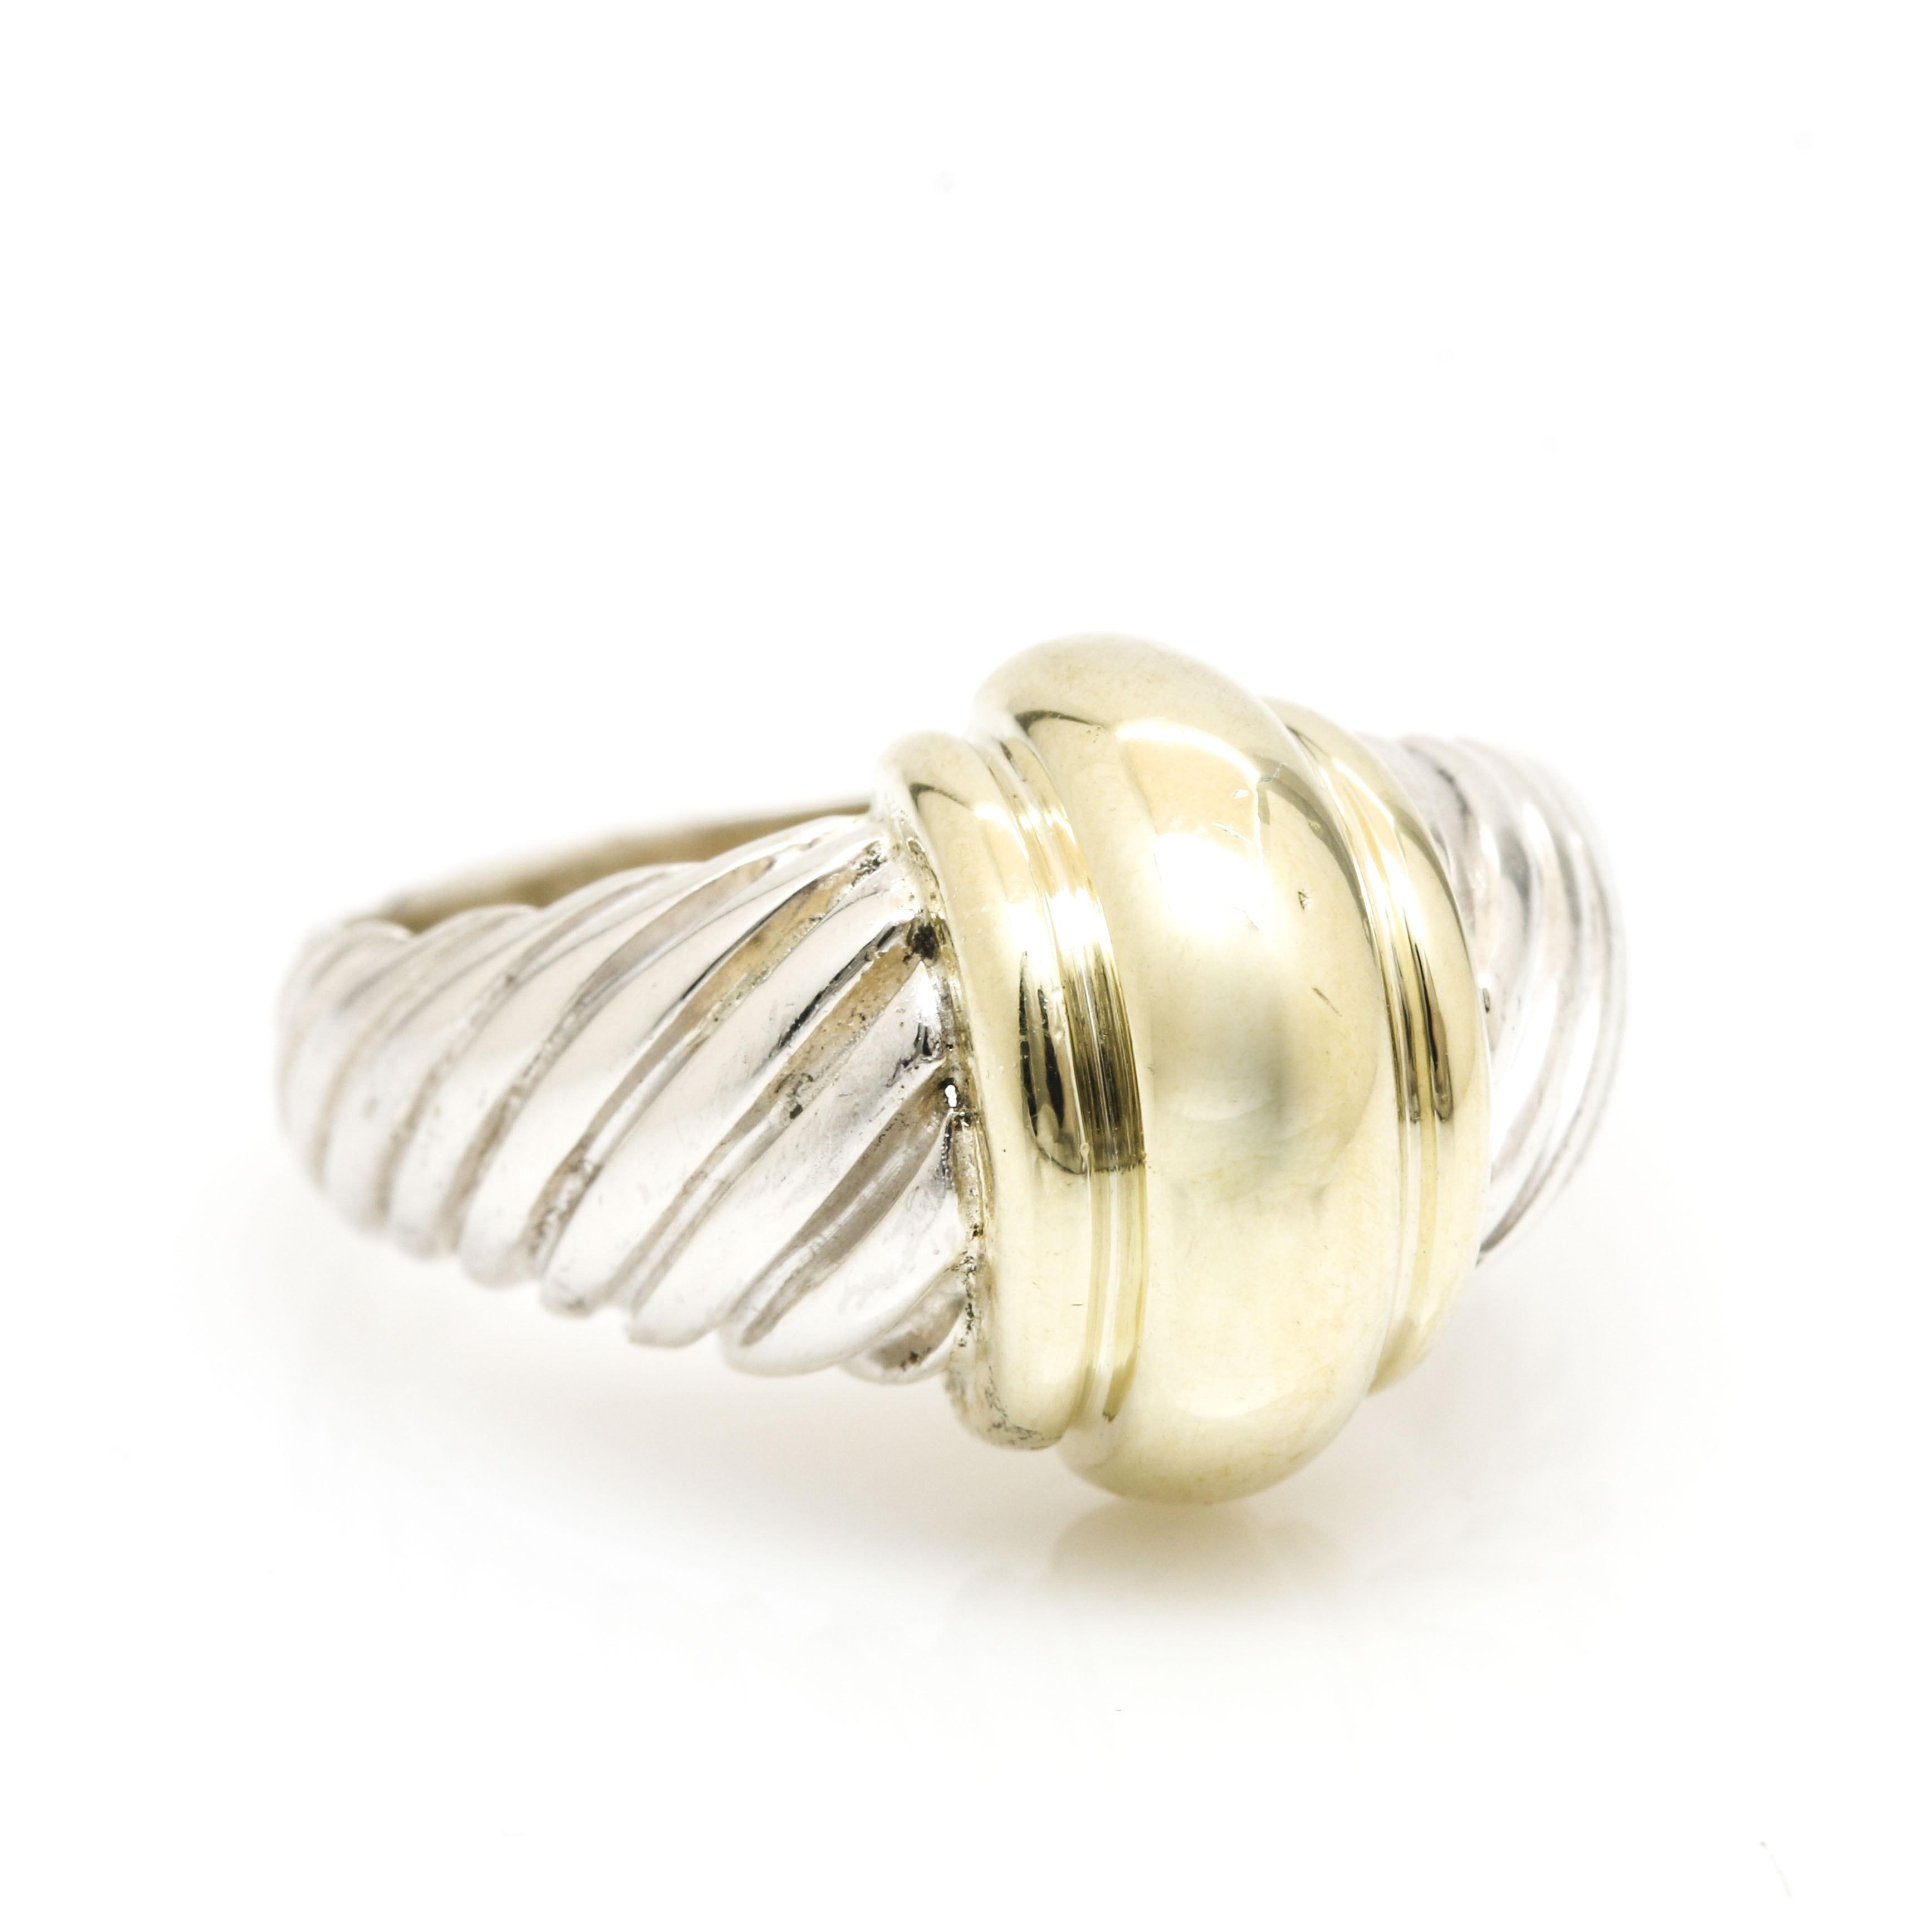 David Yurman Sterling Silver and 14K Yellow Gold Ring